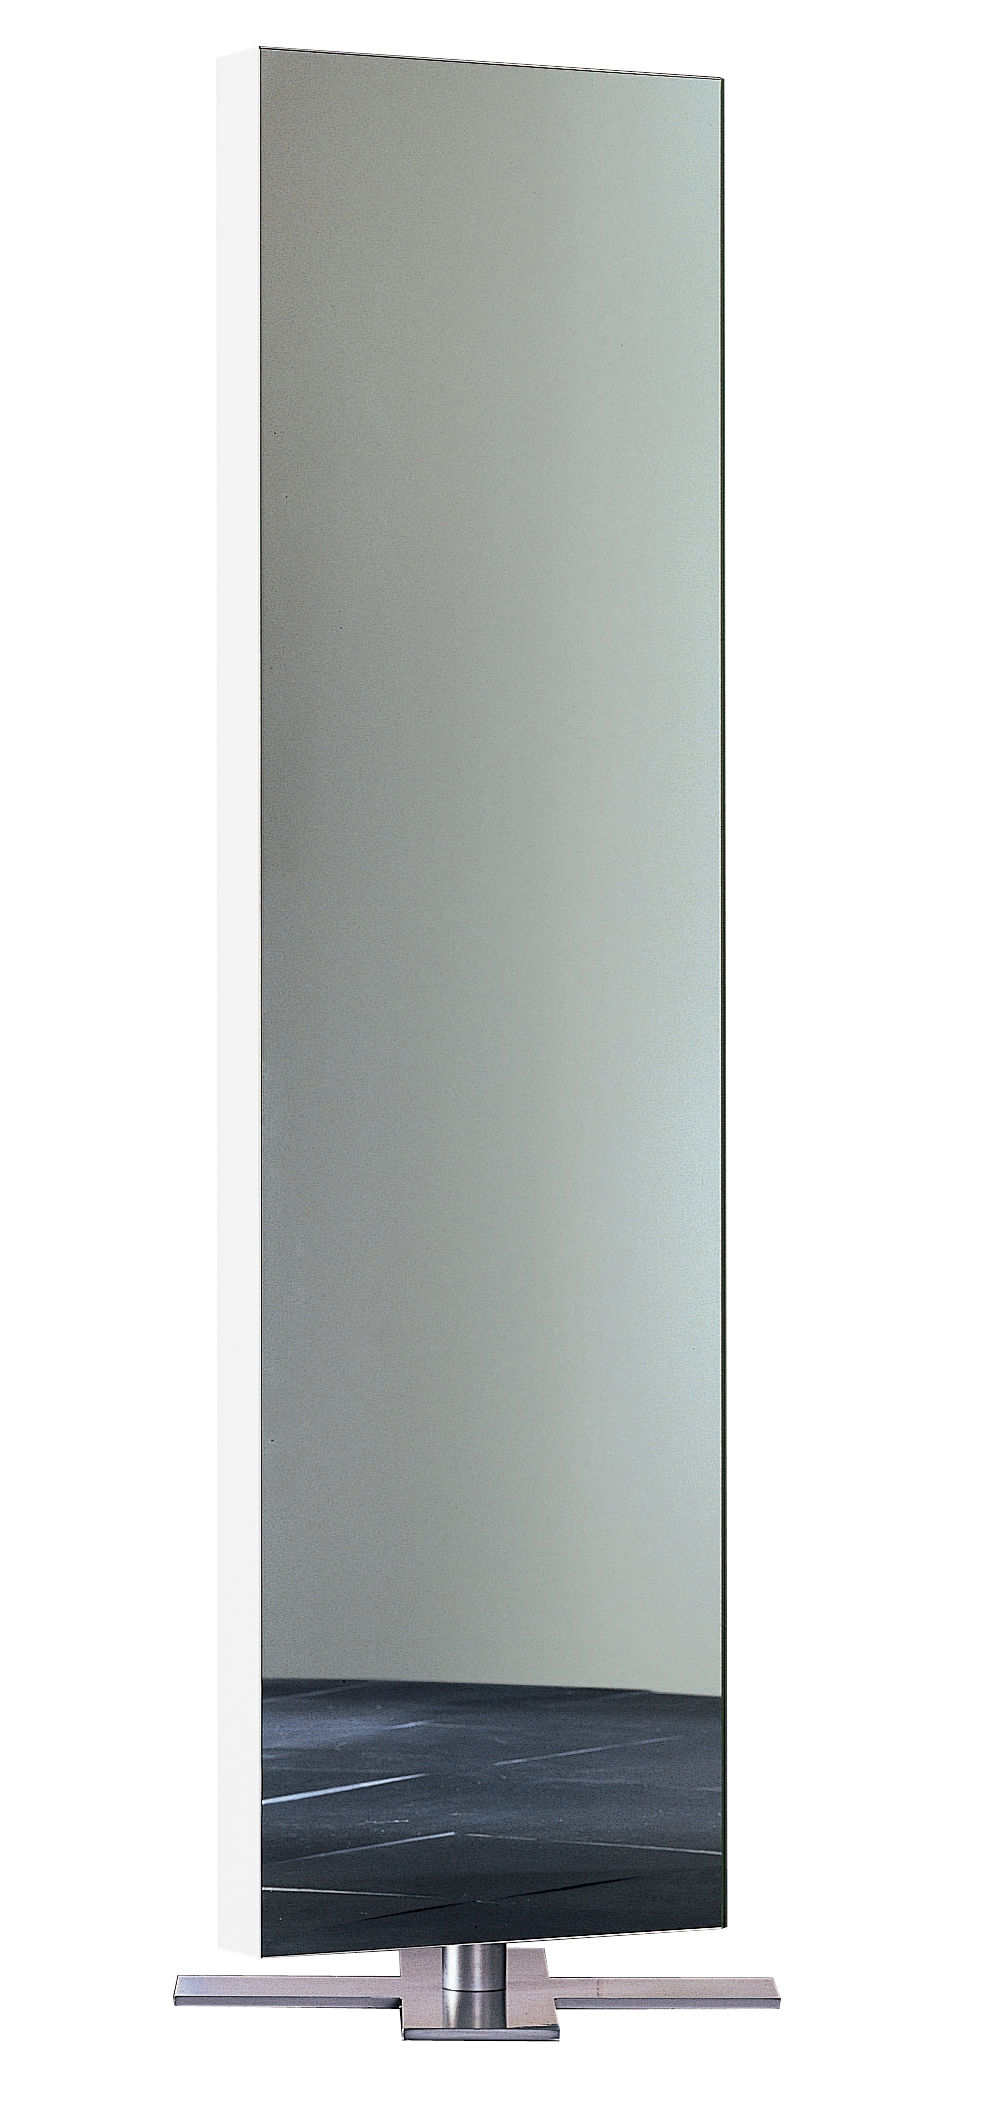 miroir giano poser au sol l 50 x h 180 cm laqu blanc glas italia. Black Bedroom Furniture Sets. Home Design Ideas